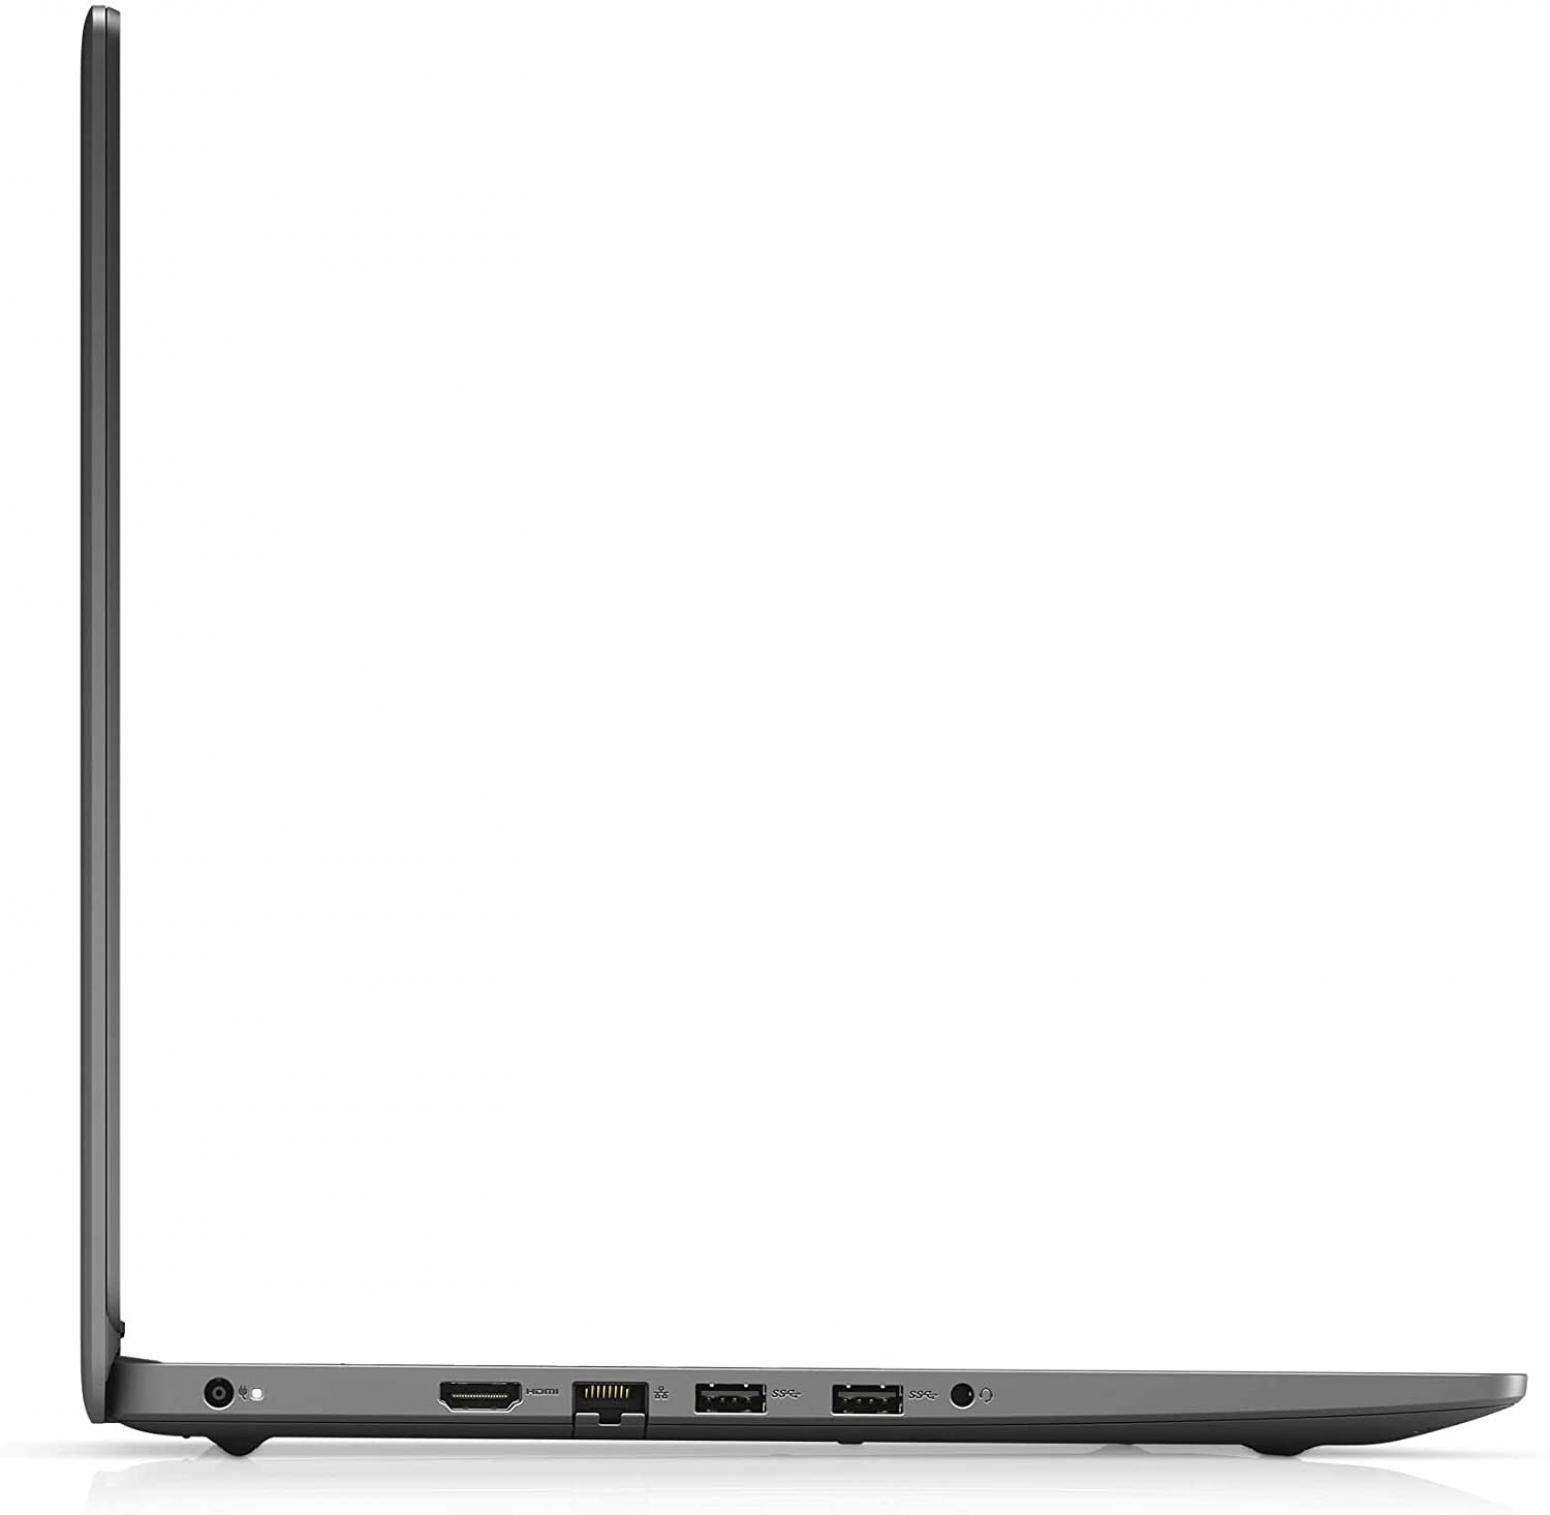 Ordinateur portable Dell Inspiron 15 3501 Noir - i3, Intel G4, SSD 256 Go - photo 2